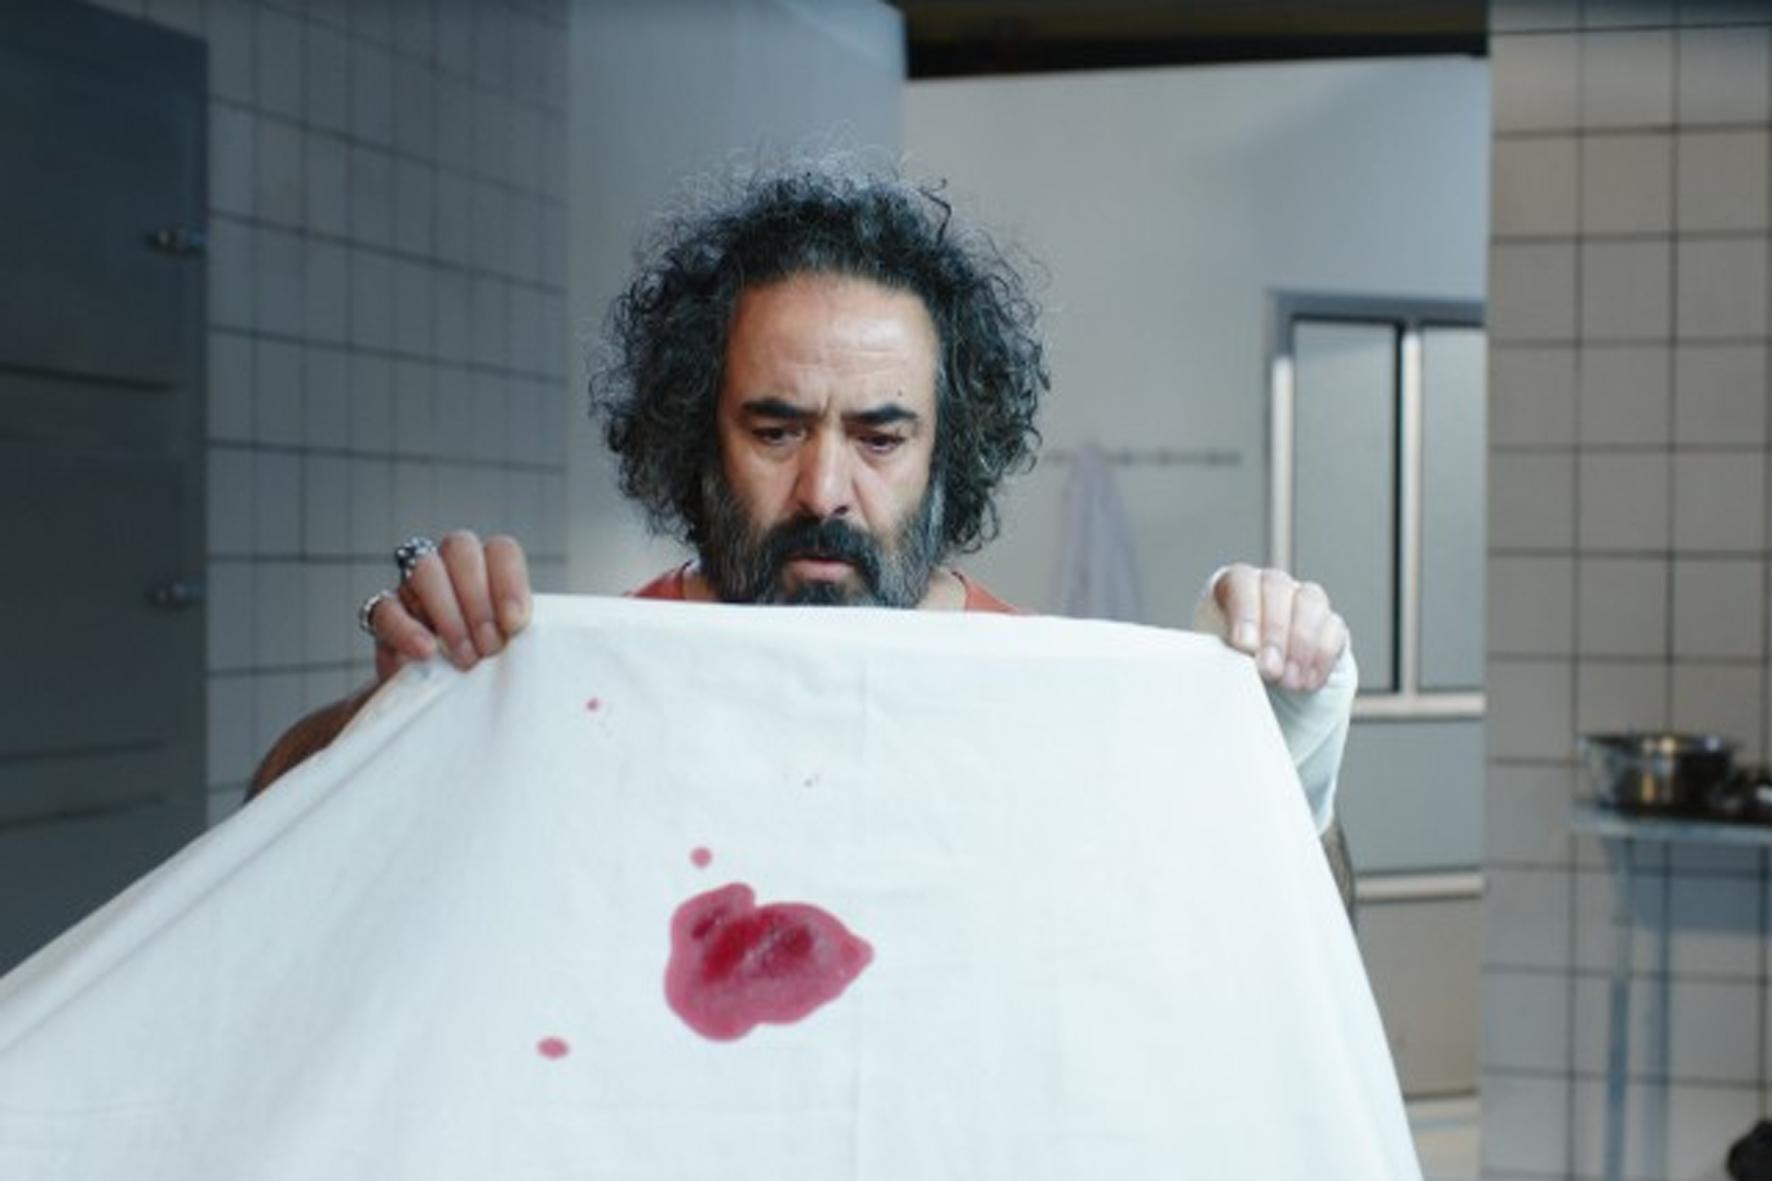 curtesey to Internationale Filmfestspiele Berlin